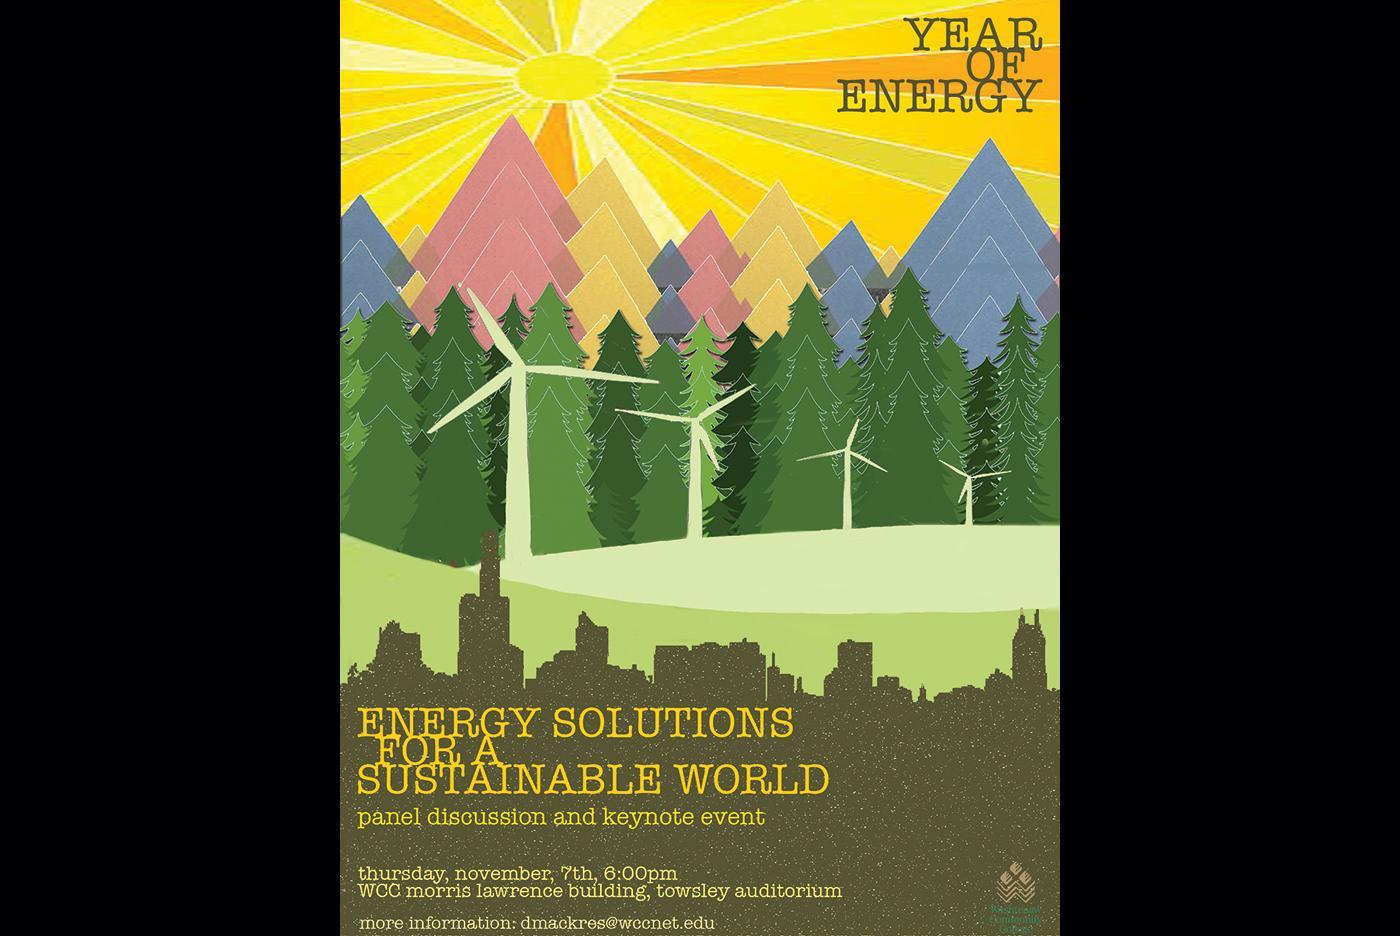 Year of Energy poster (c) Beall & Stenberg